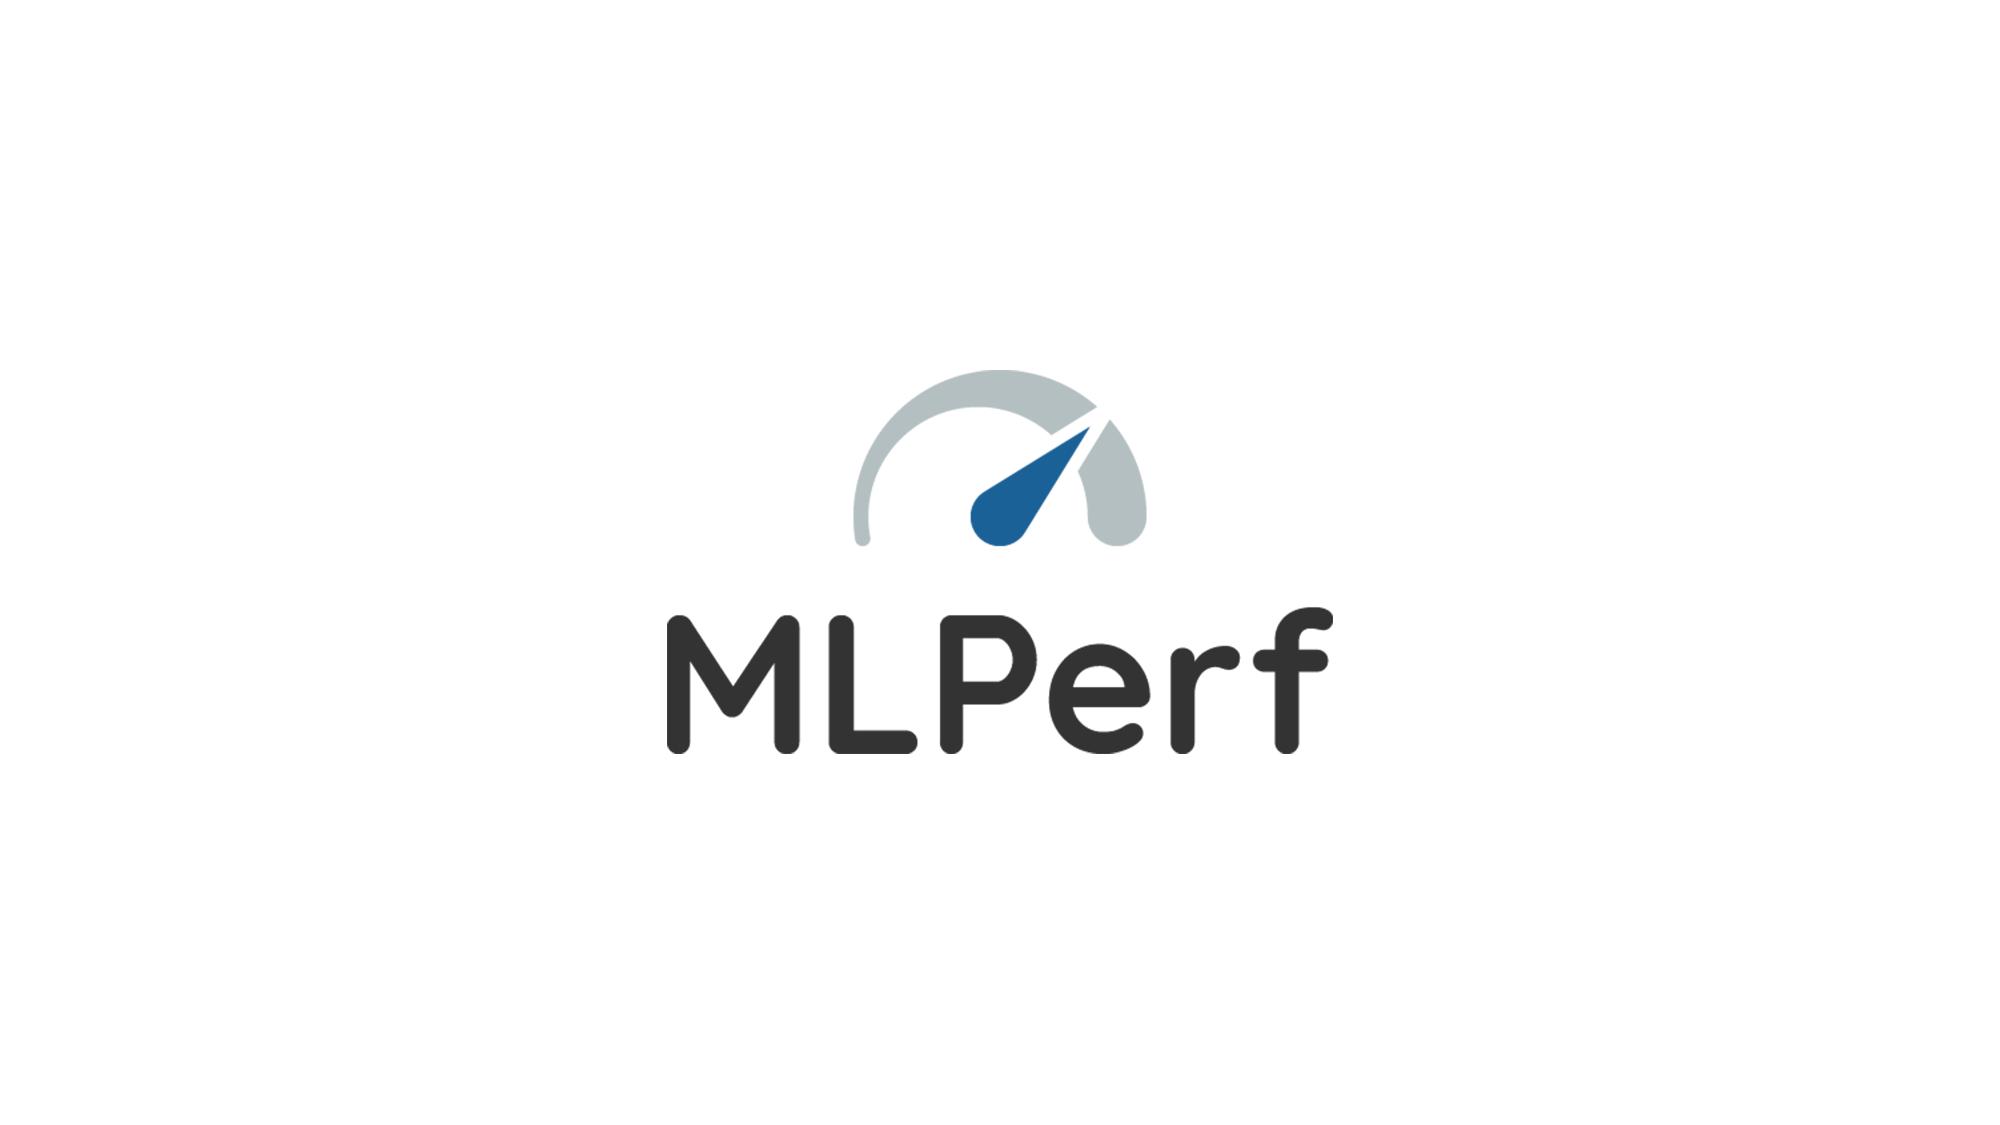 Facebook joins MLPerf, open-sources Mask R-CNN2Go - Facebook Code